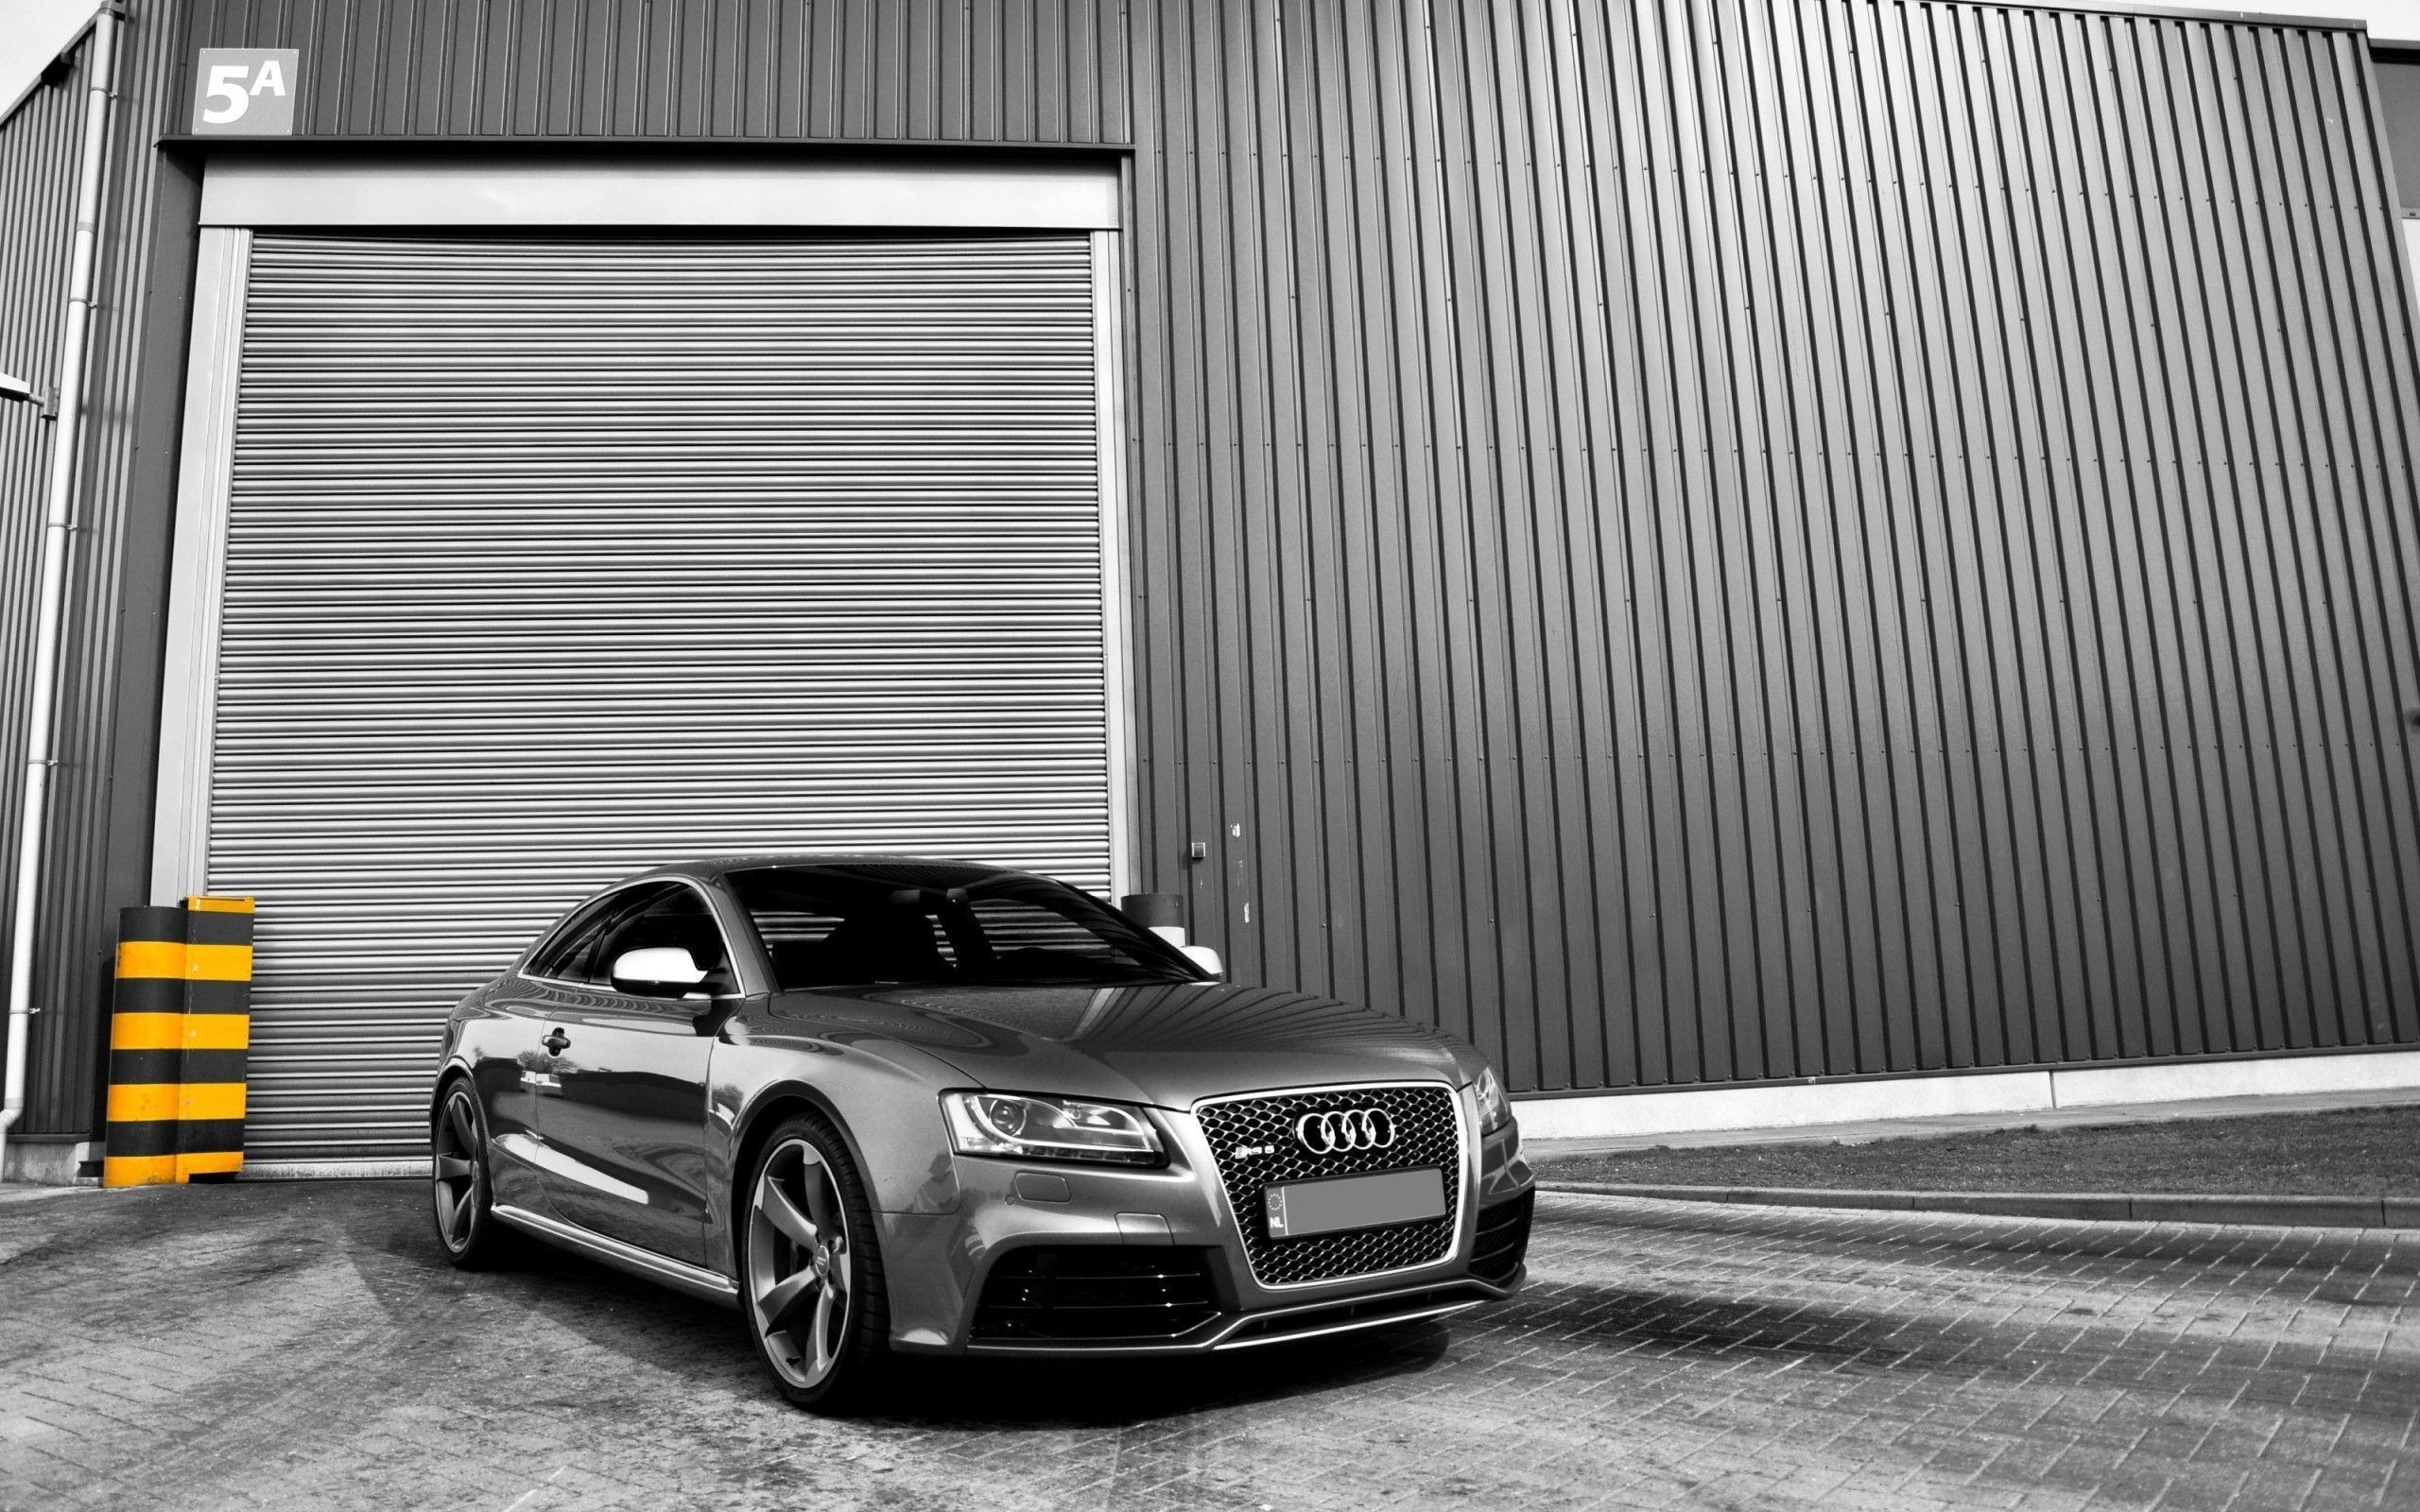 Hd Car Wallpapers Audi Rs5 Wallpapers Wallpaper Cave